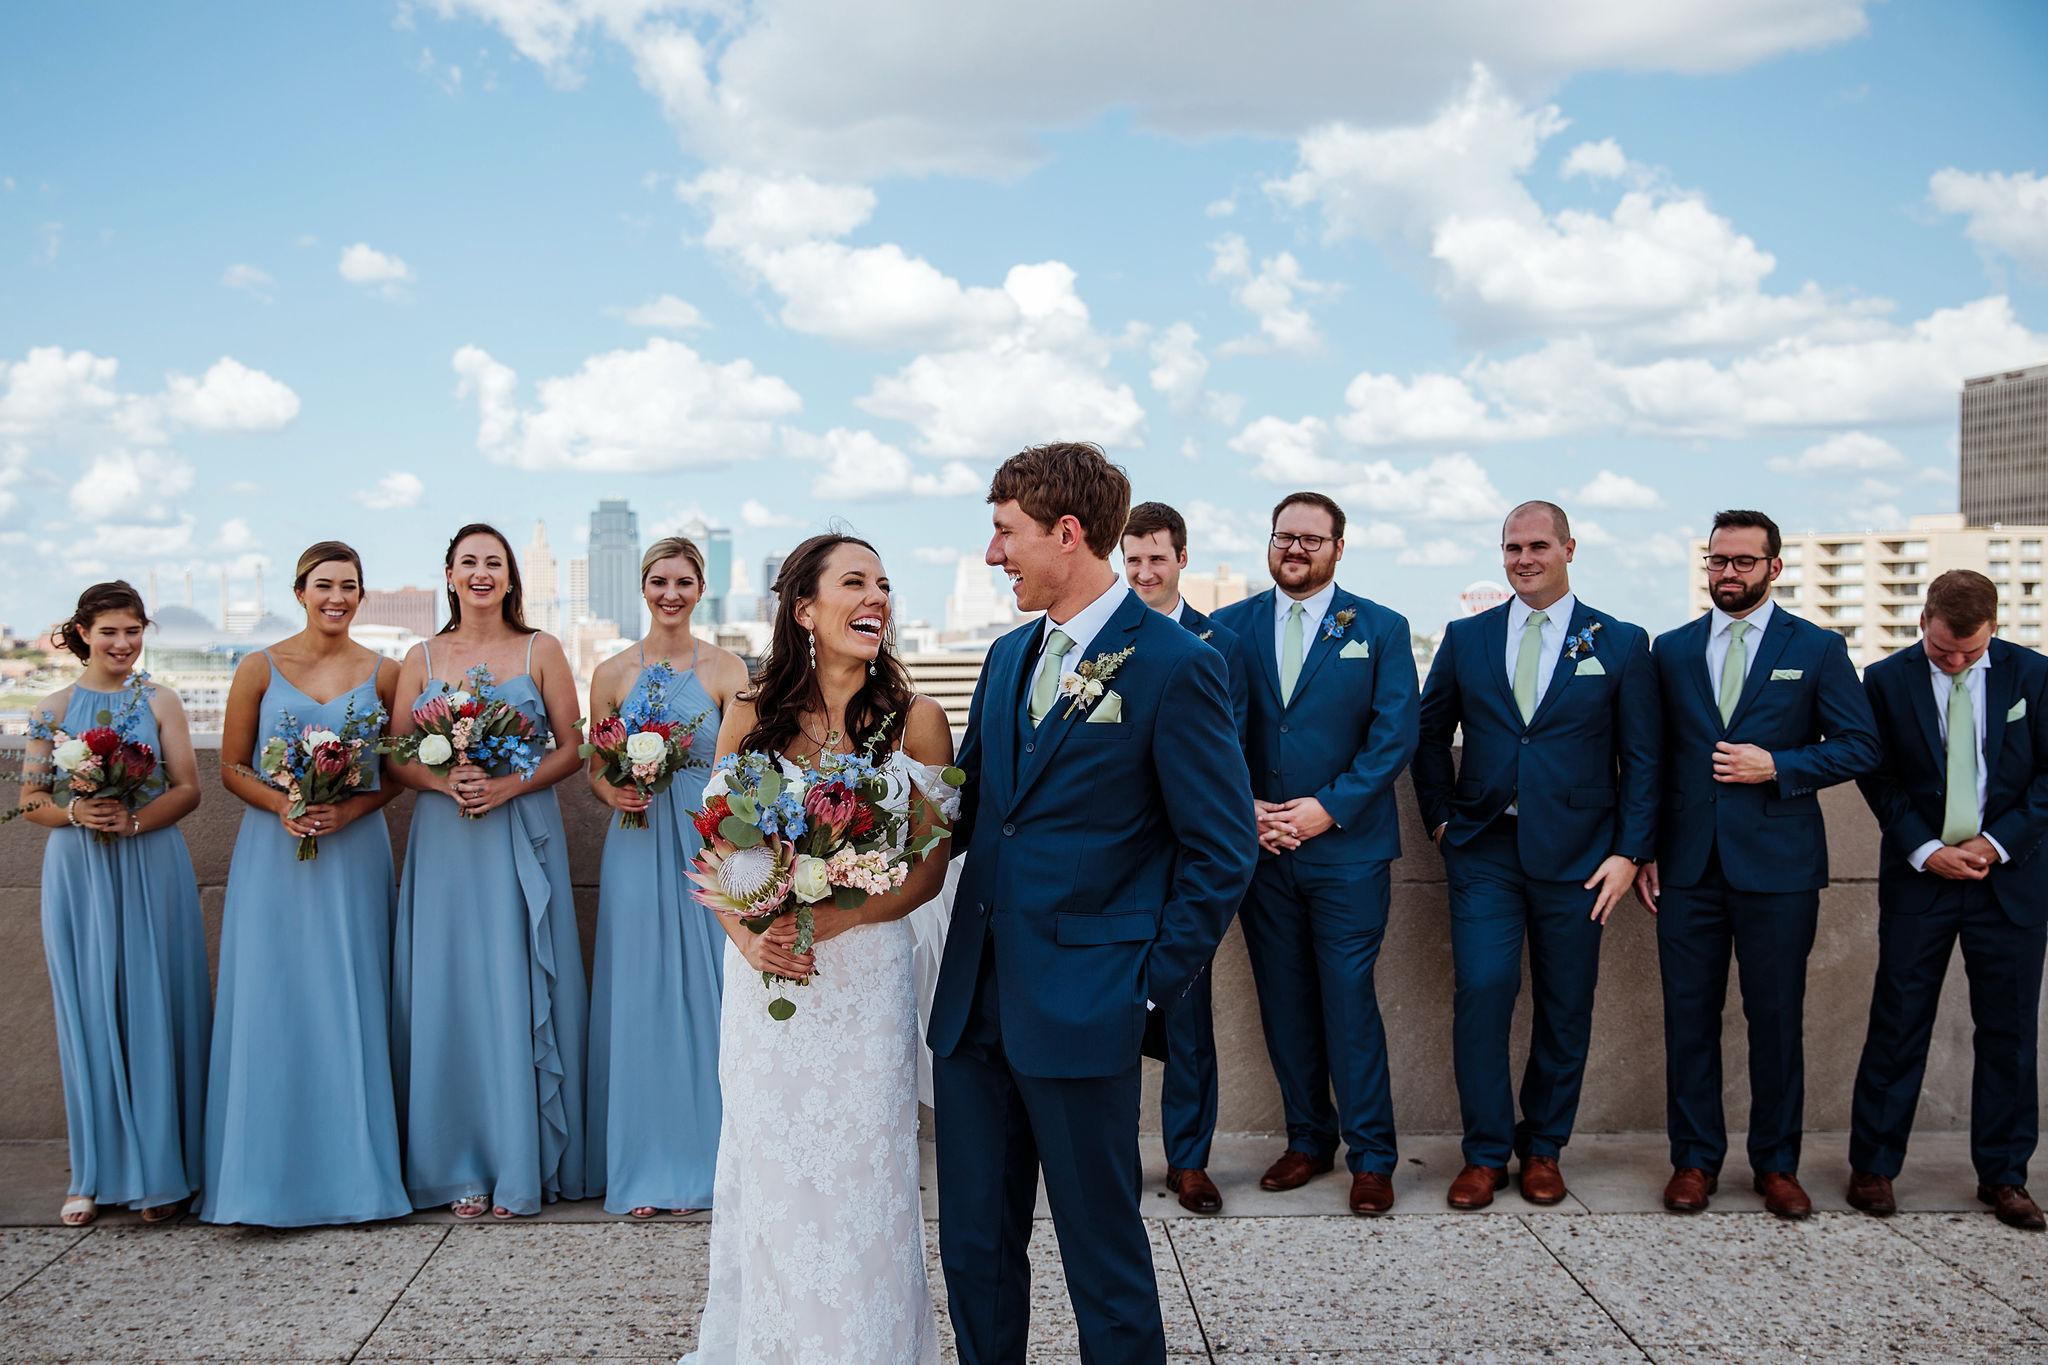 Cure of Ars and Twenty Three Event Space Station Room Wedding_Cinder Block Brewery Wedding_Kindling Wedding Photography_01.JPG